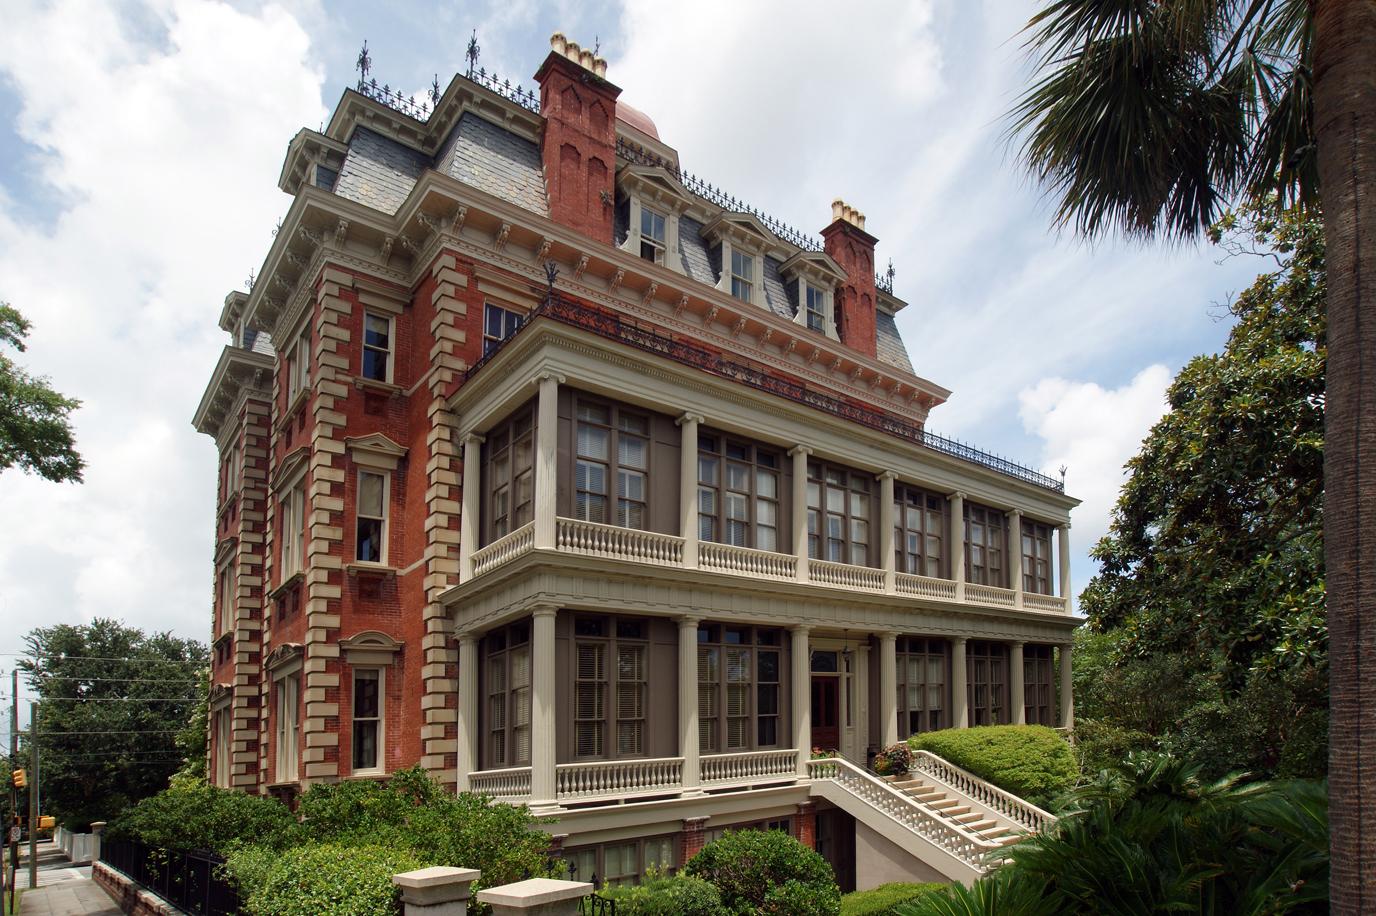 8 Elegant Mansion Hotels In The United States